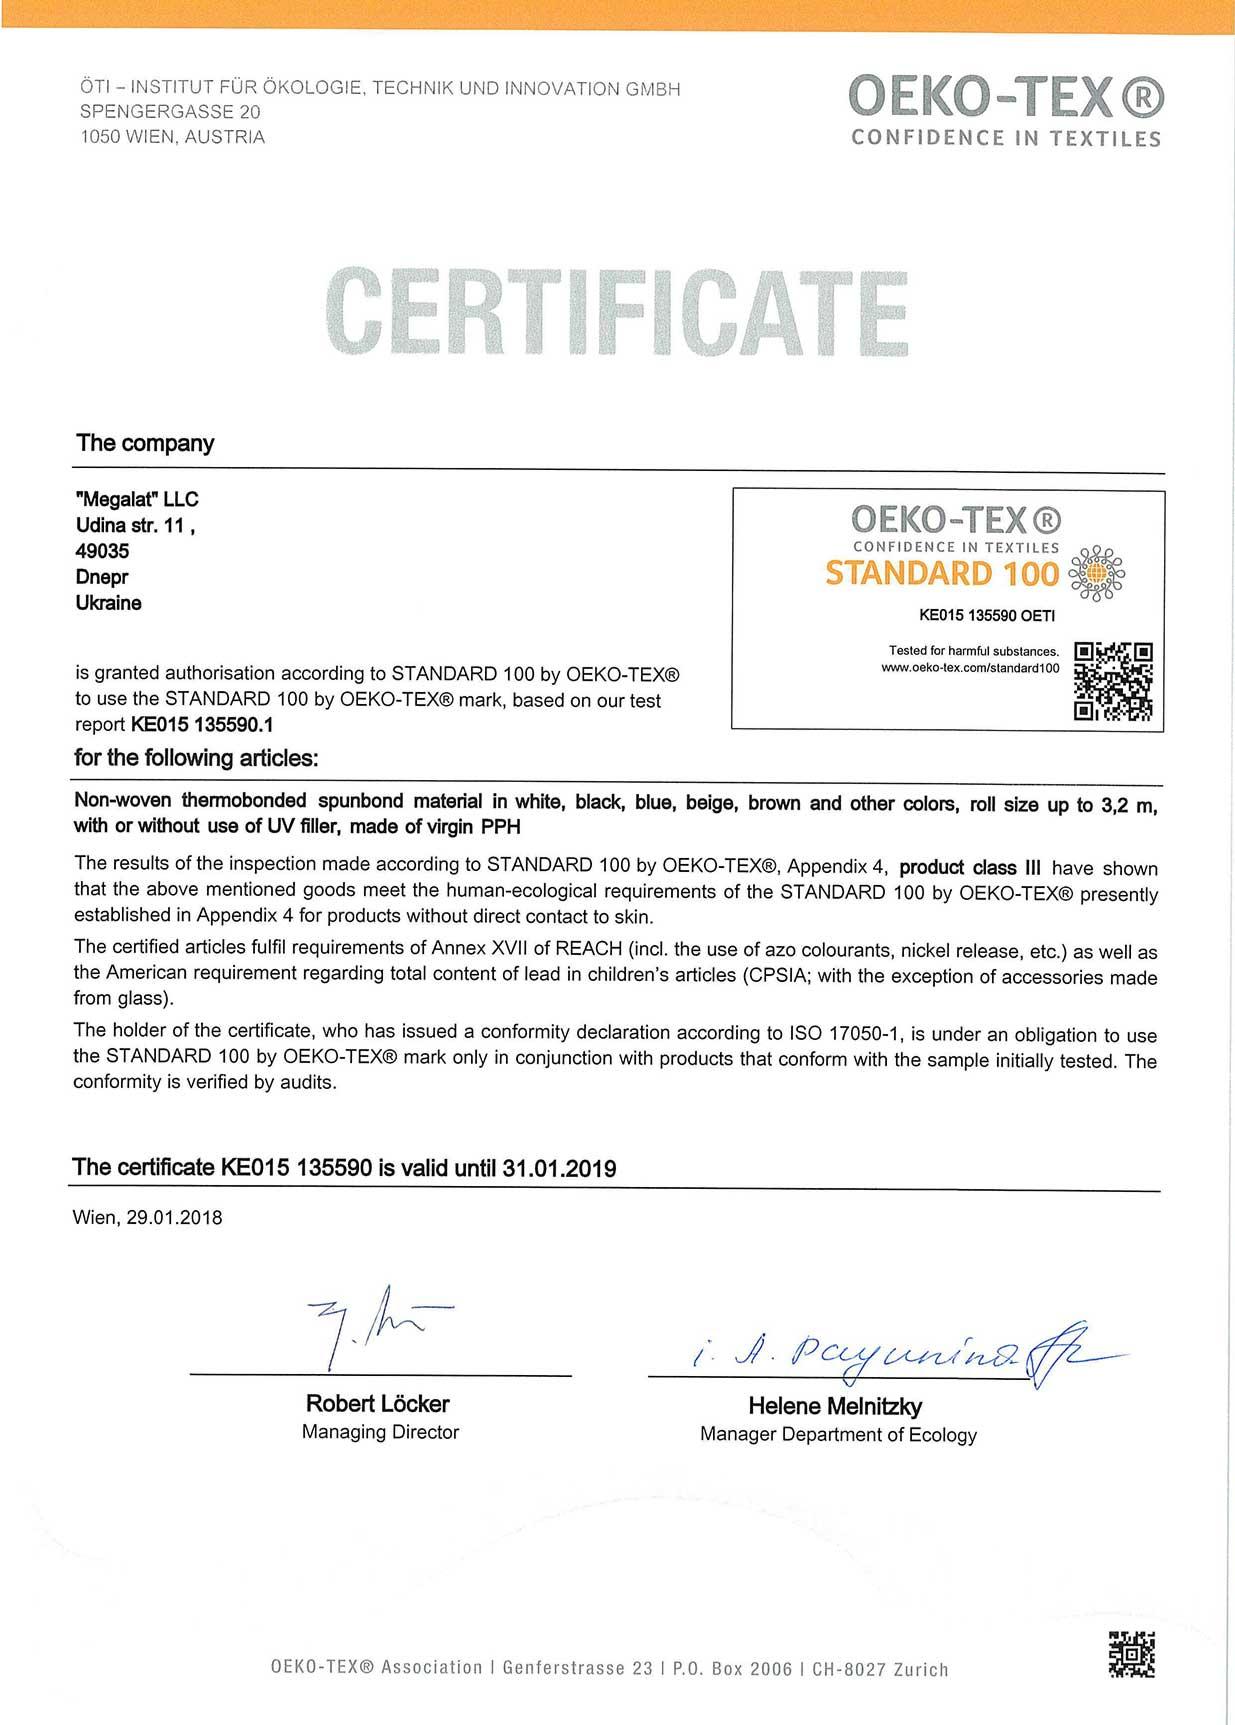 Sinta-D OEKO-TEX Standart 100